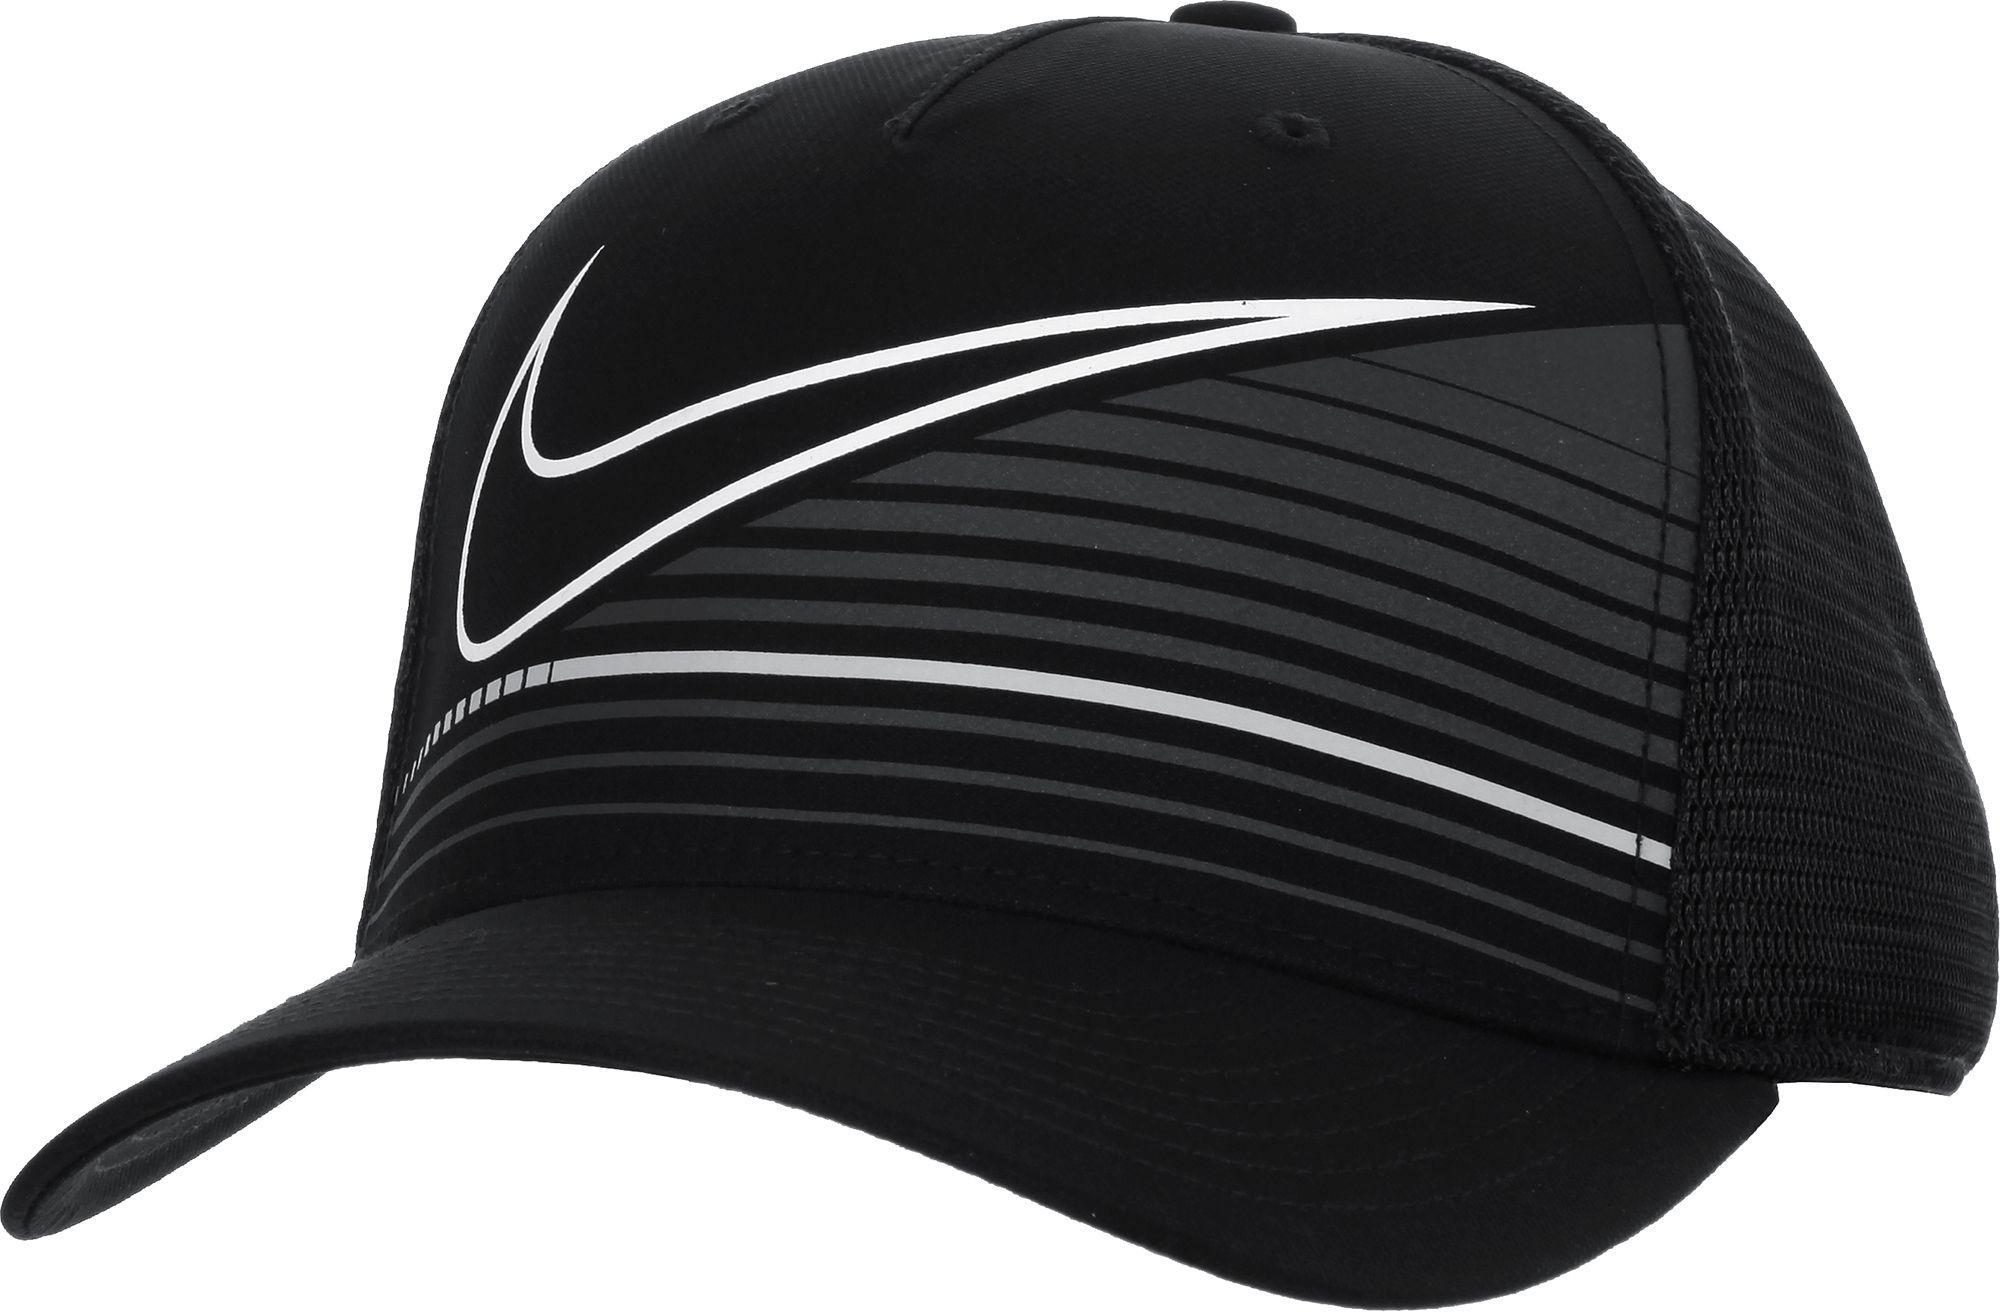 Lyst - Nike Classic99 Print Golf Hat in Black for Men 8cf19ed1cb4